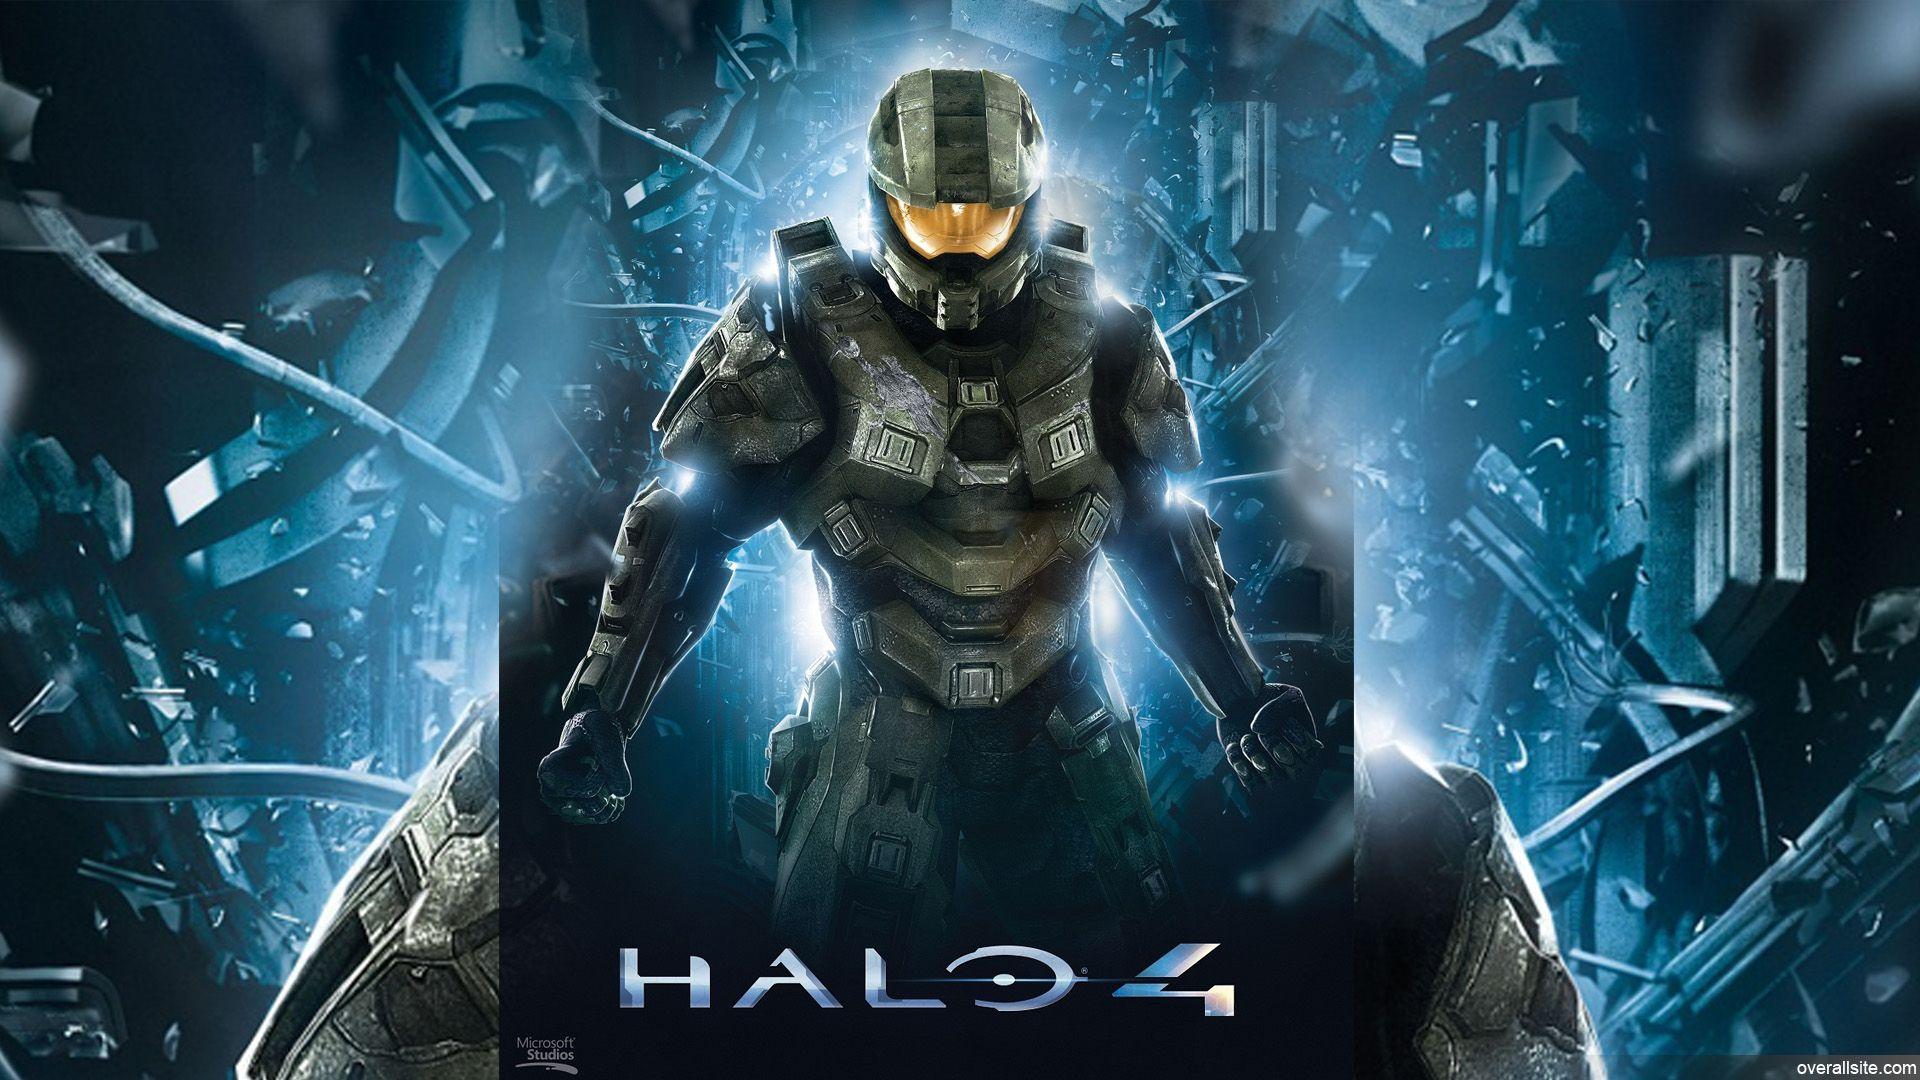 Halo Hd Fondos De Pantalla: Halo 4 Video Games Wallpapers HD